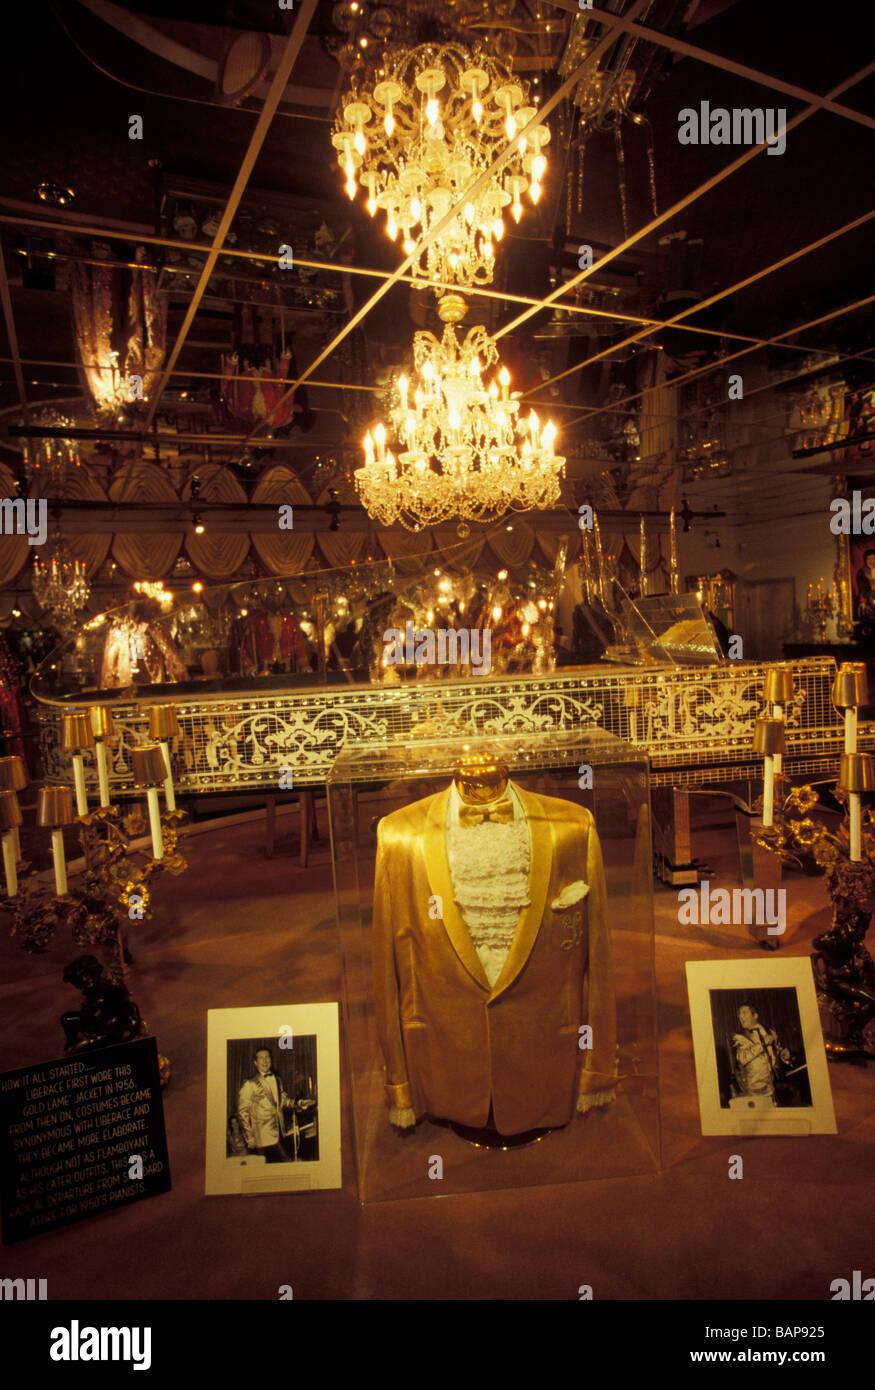 liberace museum las vegas nevada stock photo royalty free image 23846989 alamy. Black Bedroom Furniture Sets. Home Design Ideas